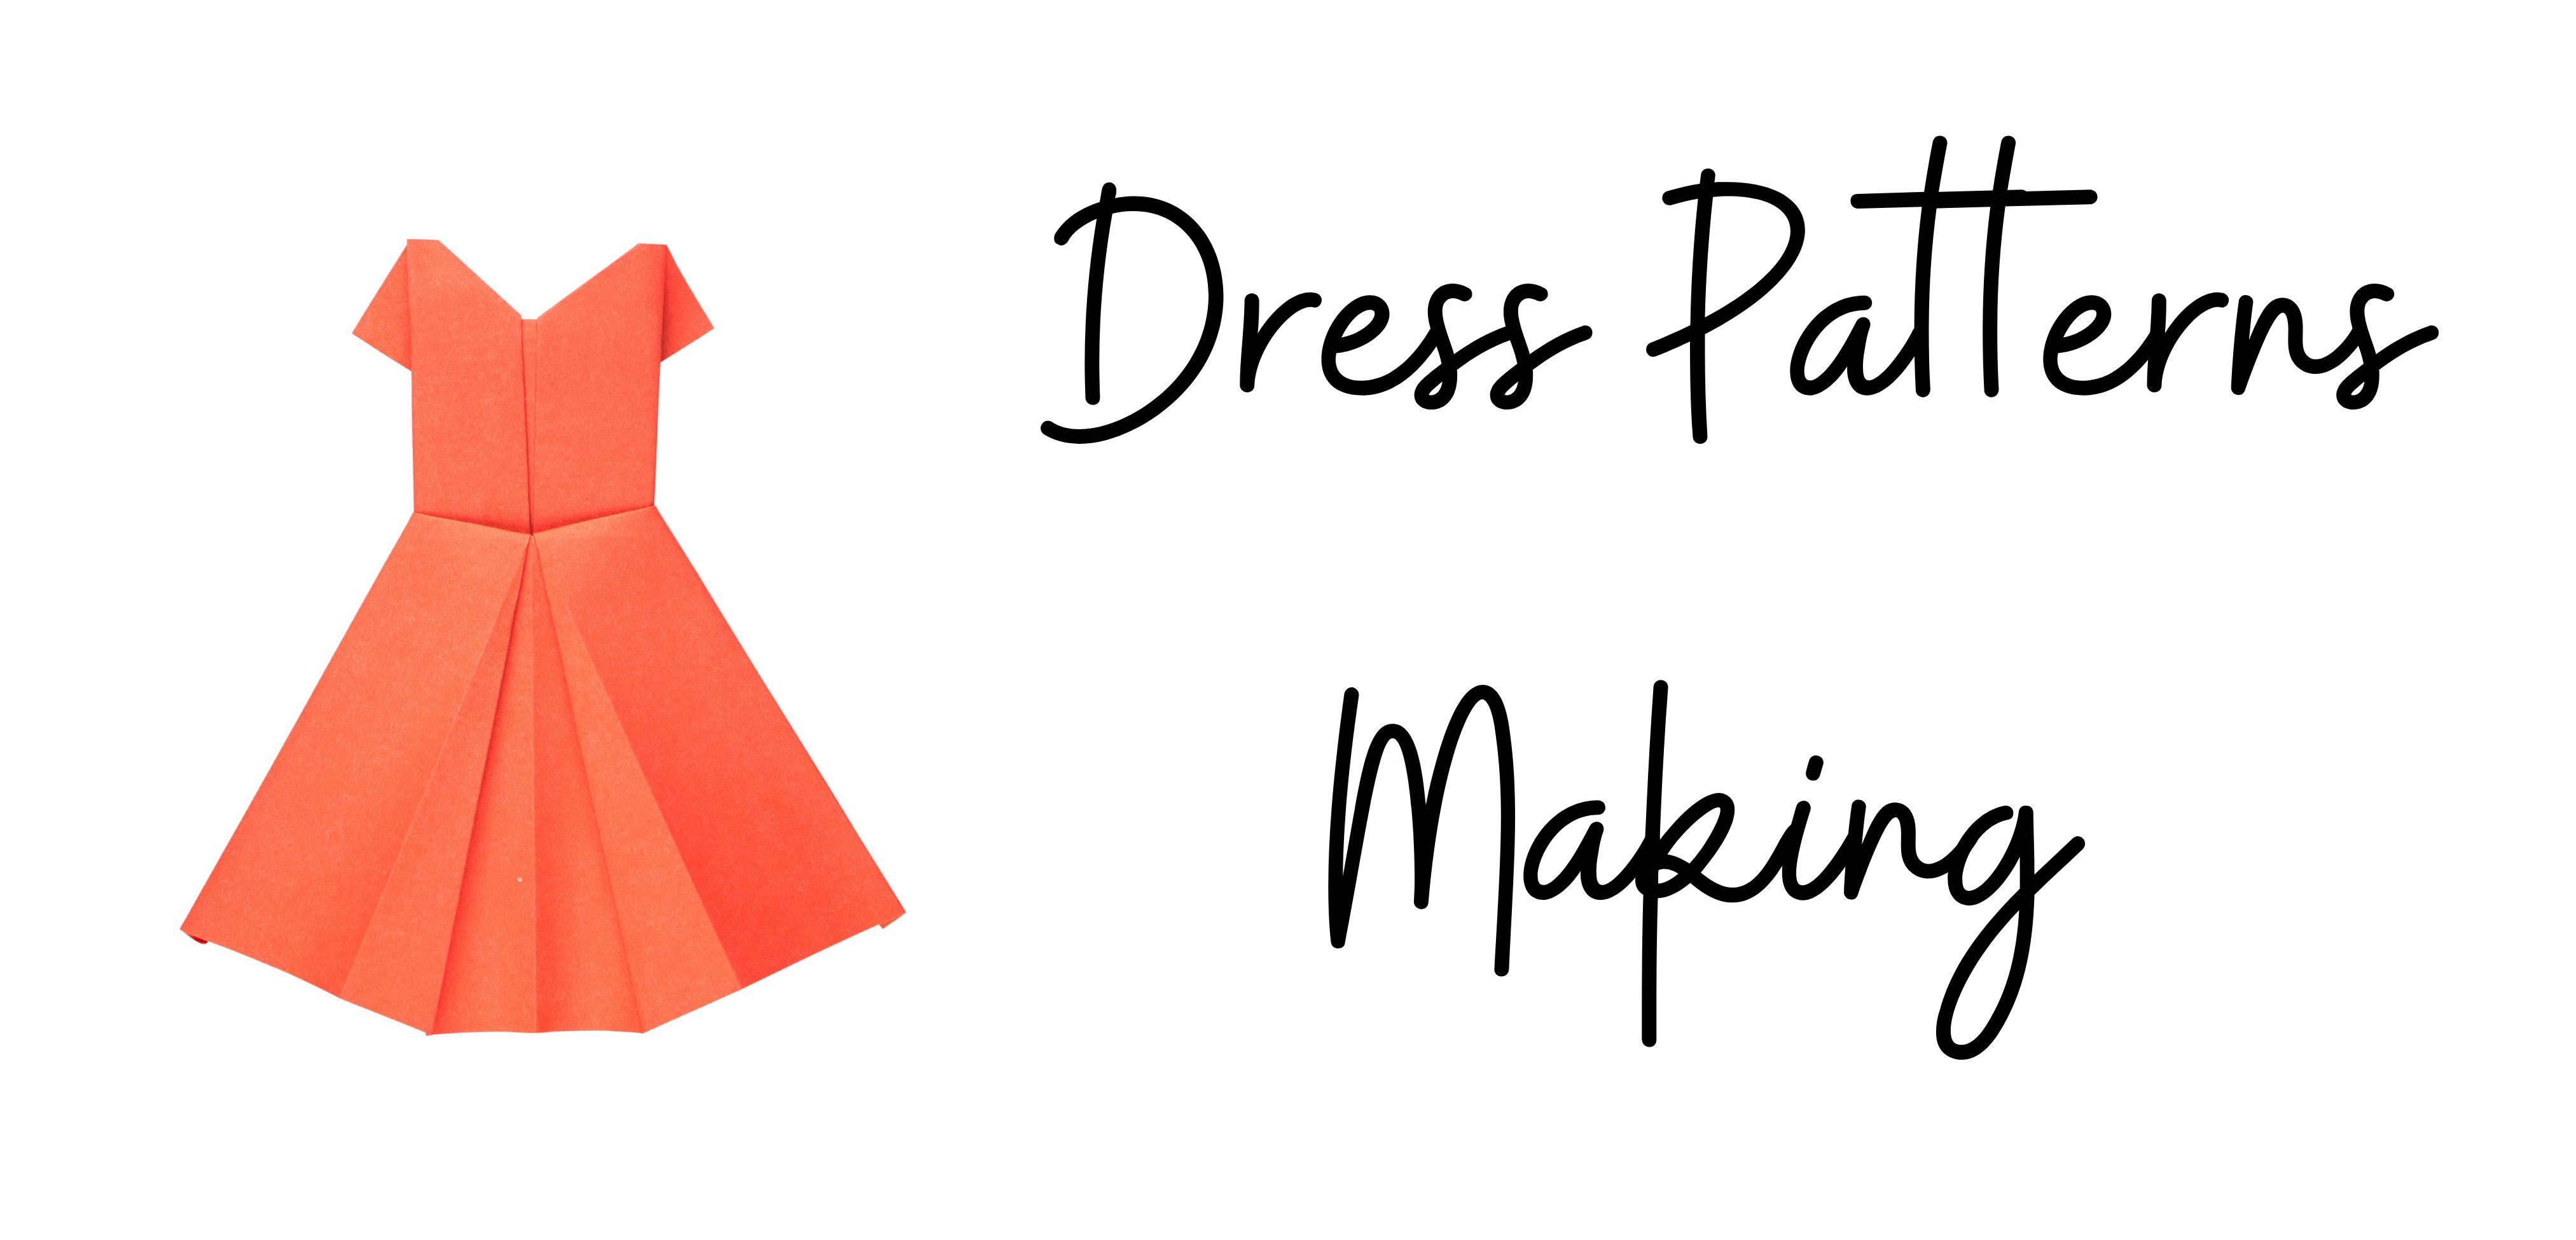 DressPattern Making